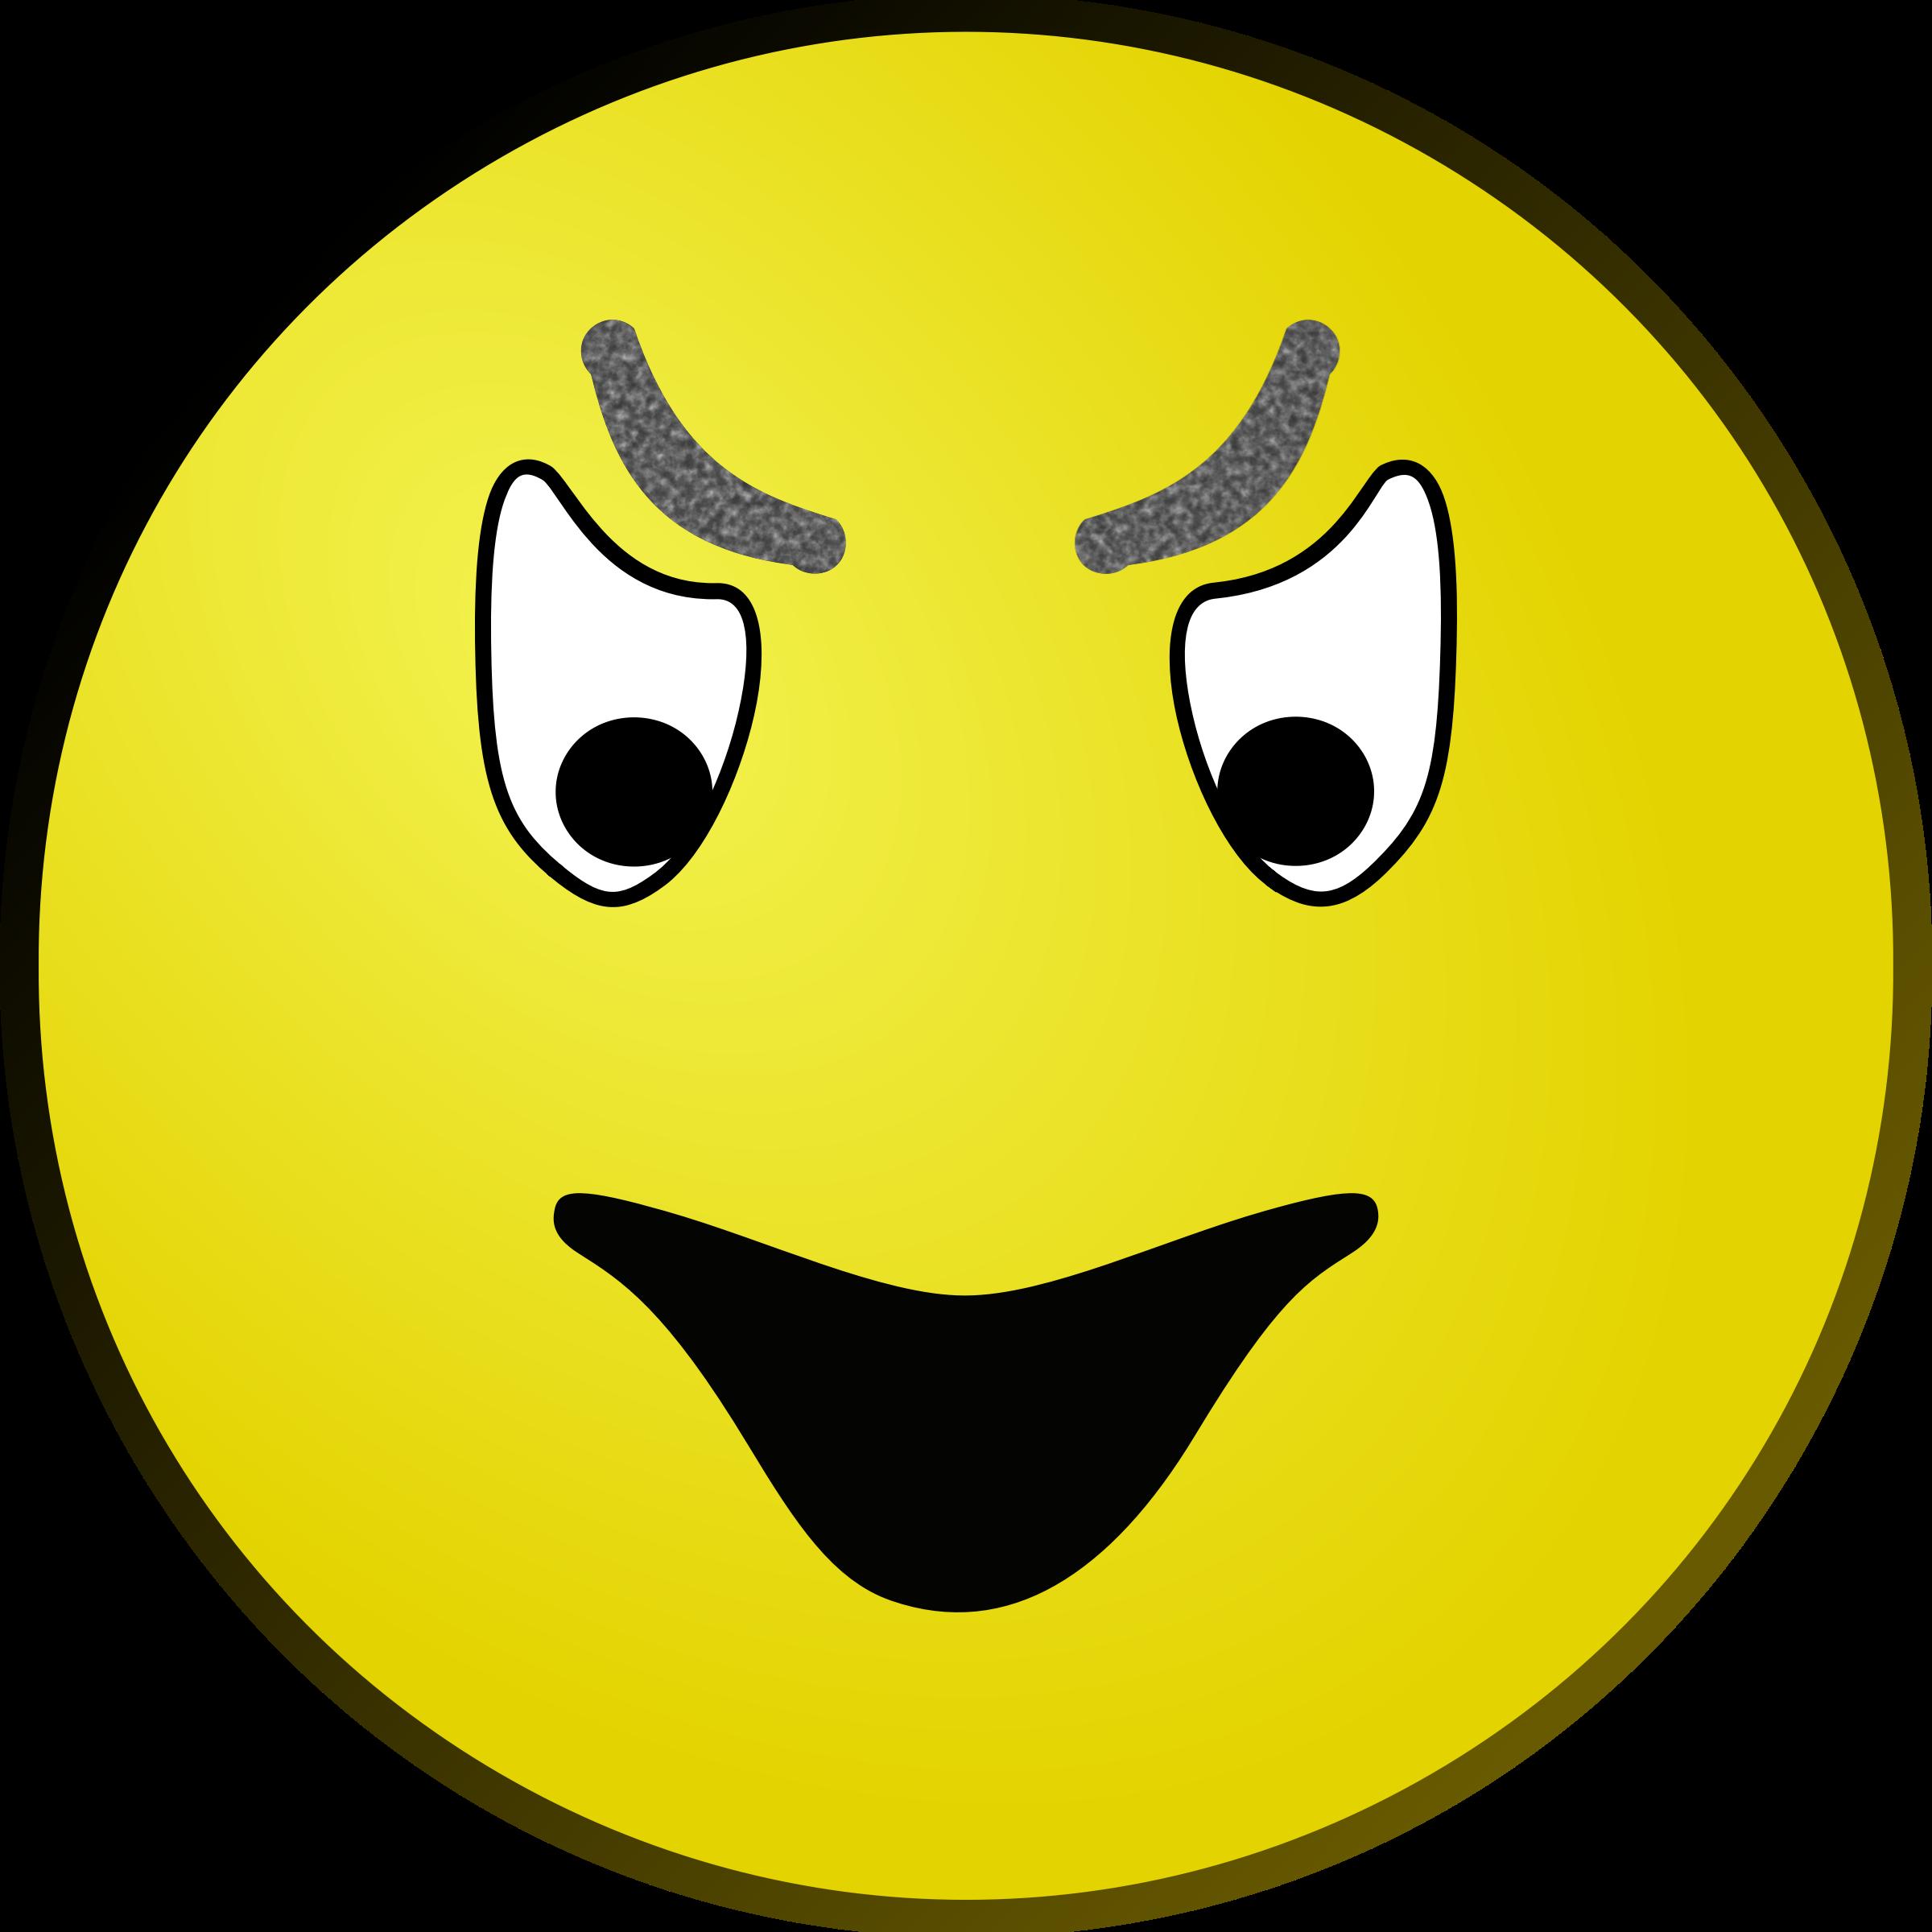 Phone clipart evil. Smiley big image png